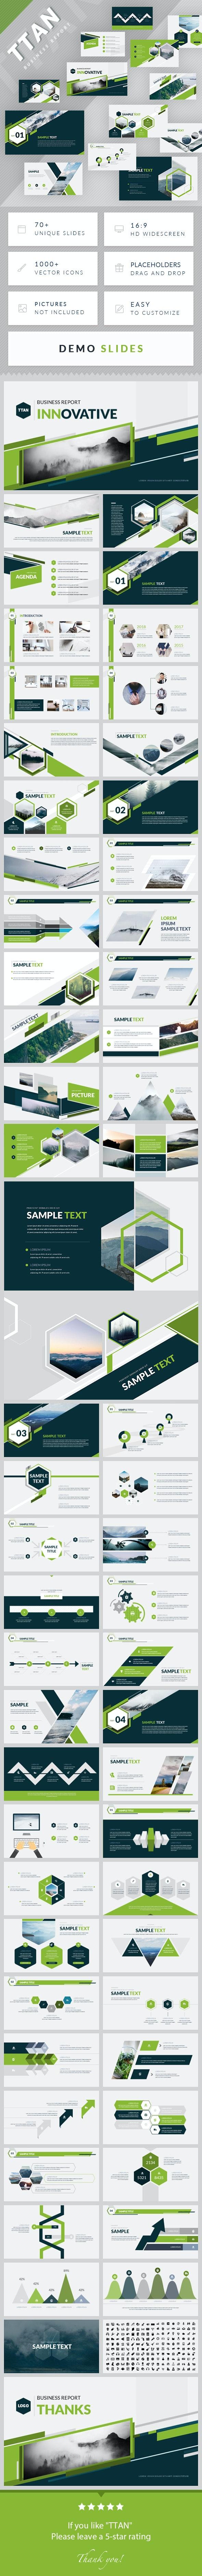 TTAN - Minimal Keynote Presentation Template - Business Keynote Templates